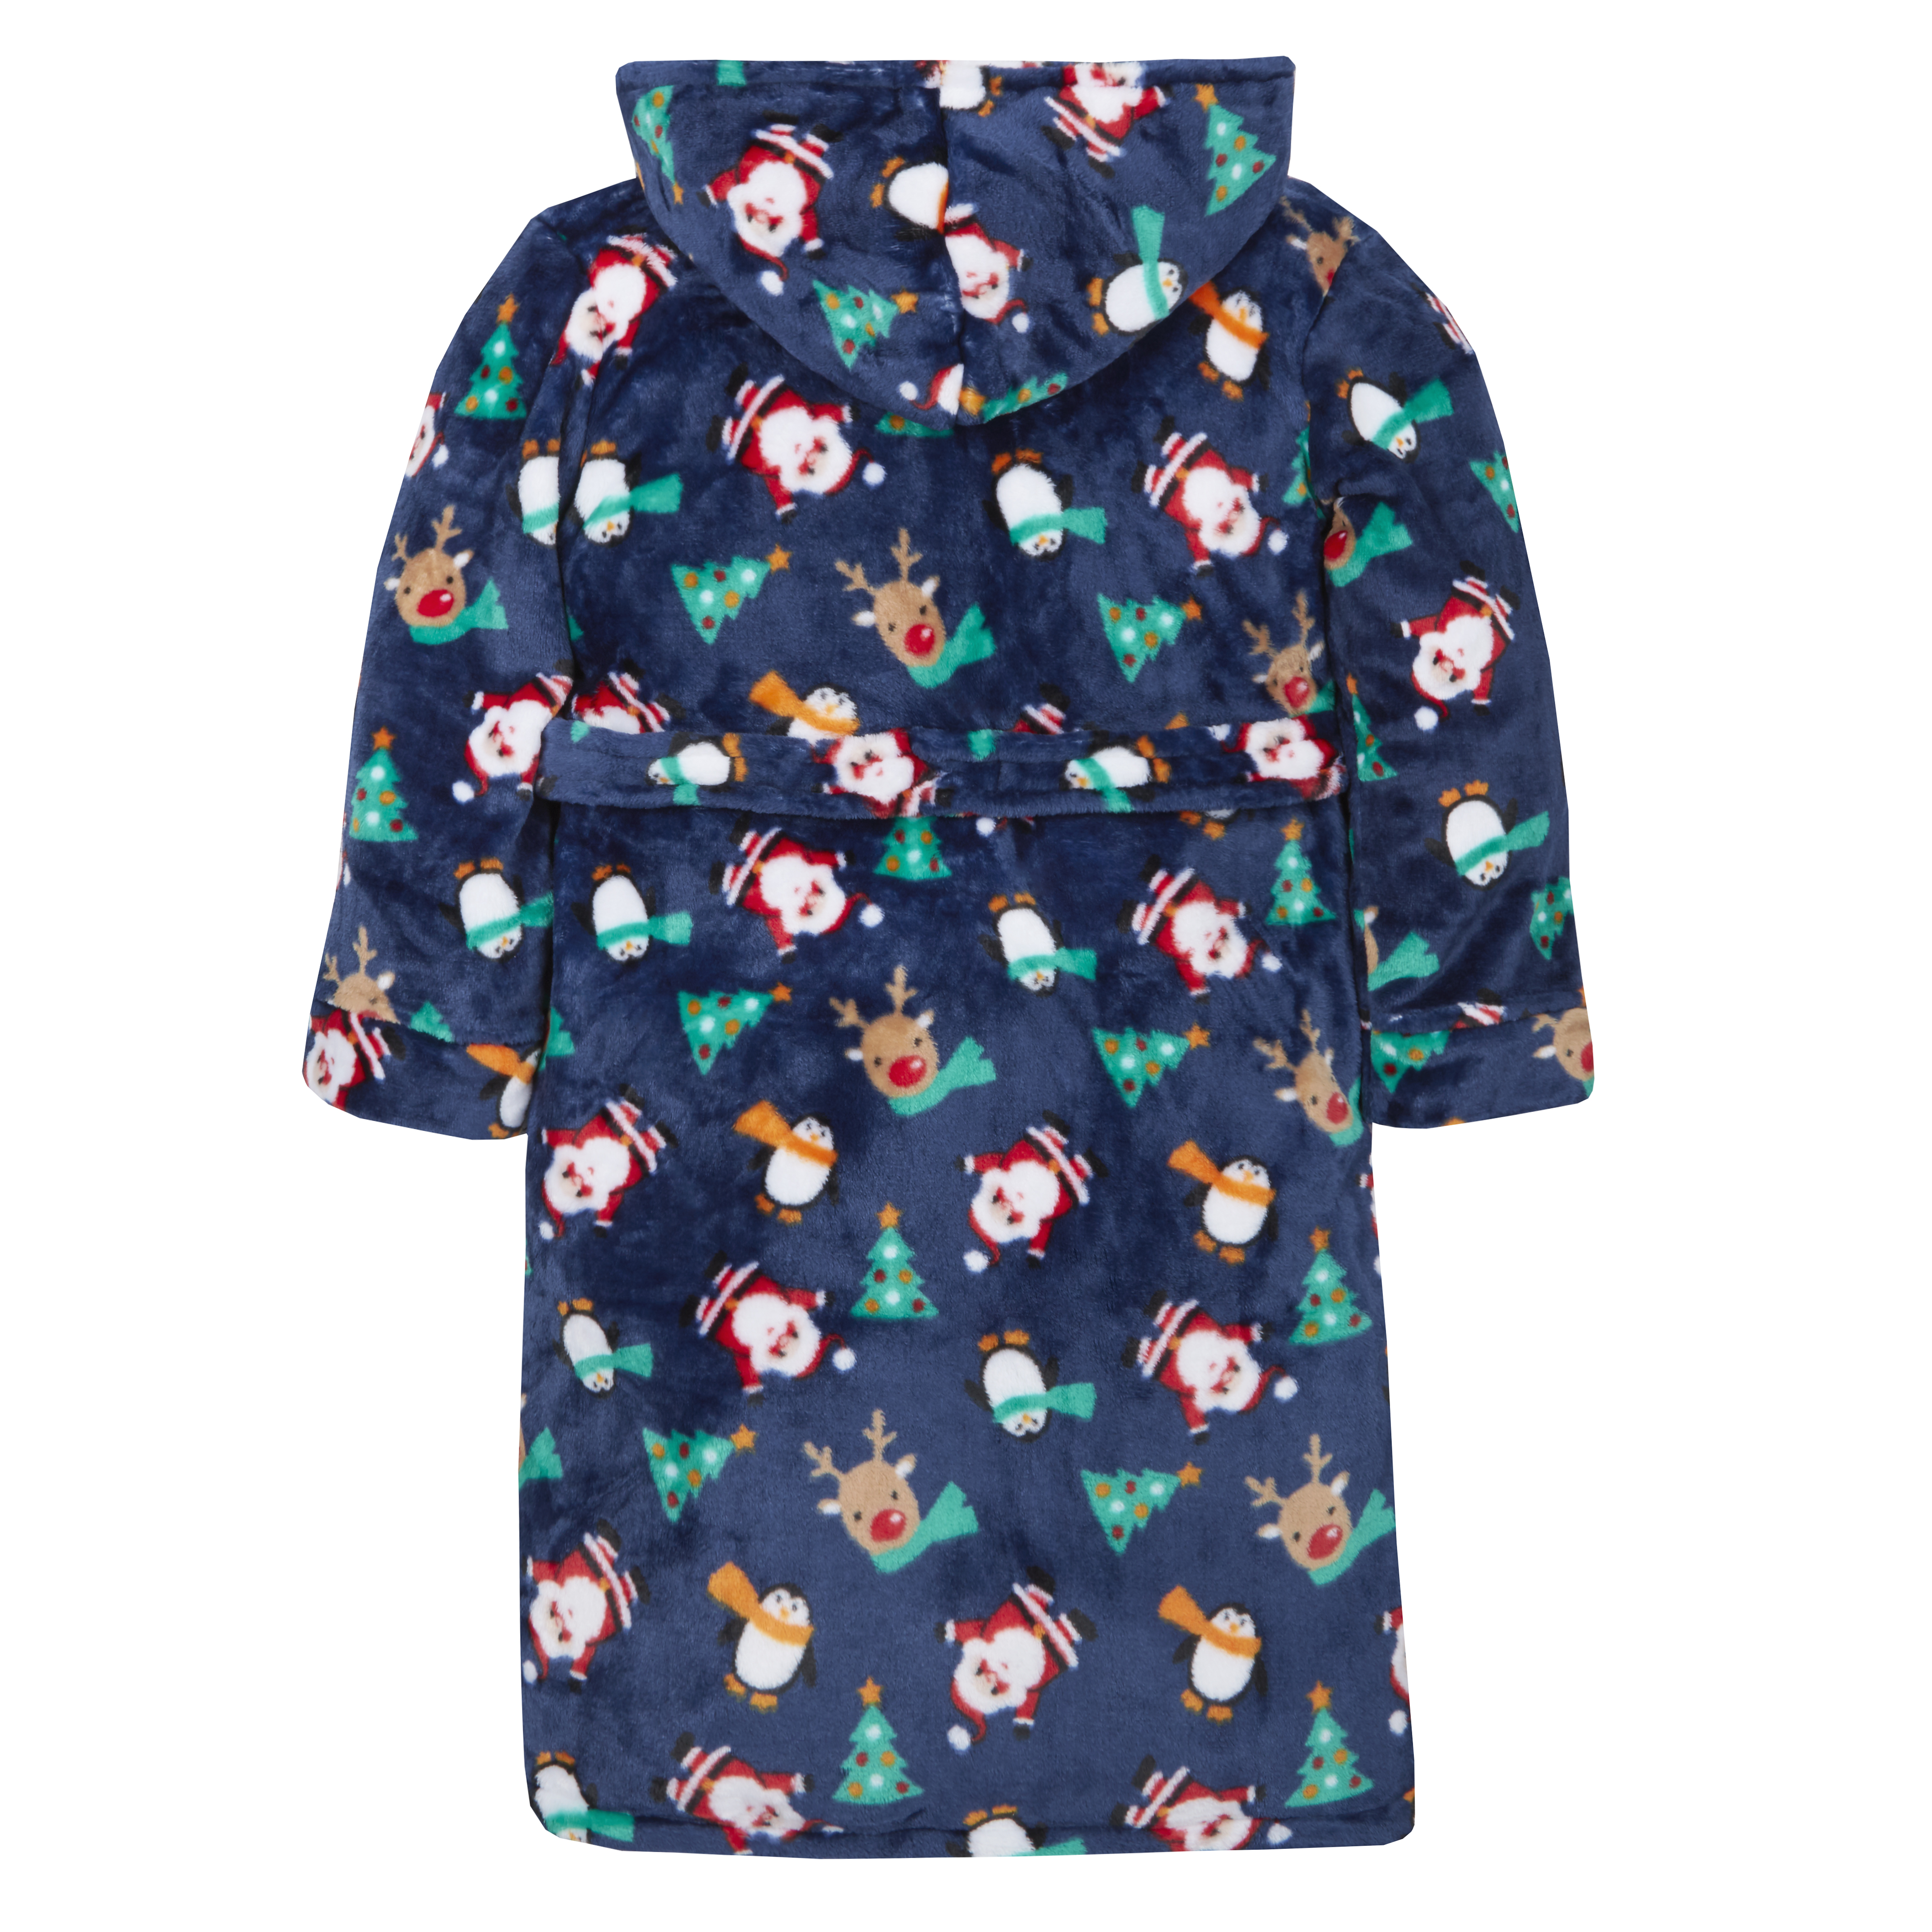 MiniKidz /& 4Kidz Childrens//Boys Blue Outer Space Print Plush Fleece Dressing Gown 7-8 Years